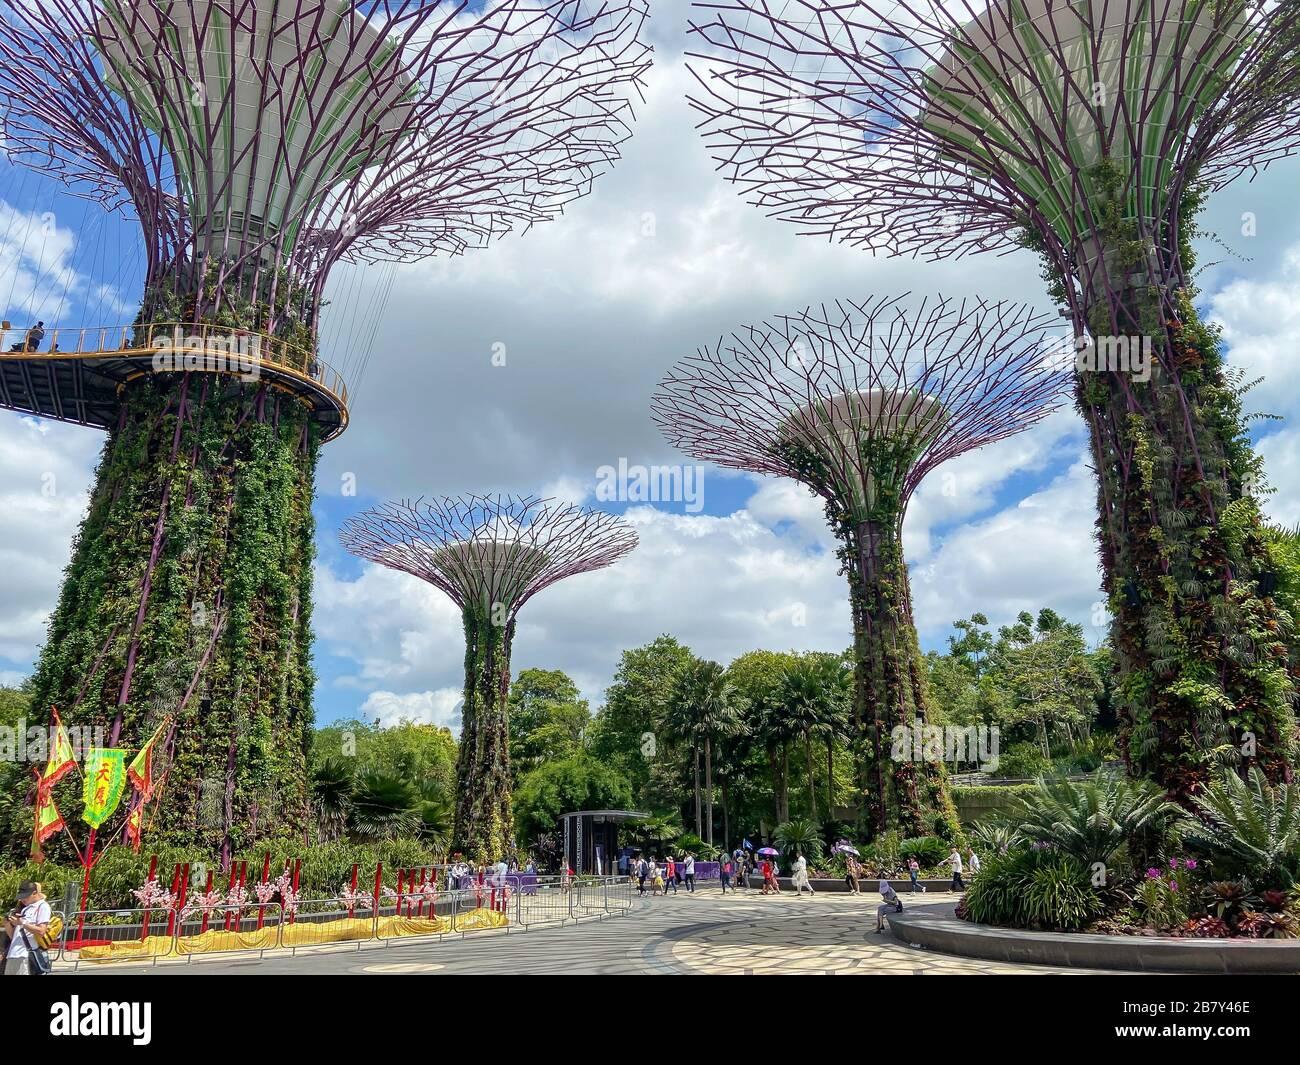 Supertree Grove and Skyway, Gardens by the Bay, Marina Bay, Singapore Island (Pulau Ujong), Singapore Stock Photo